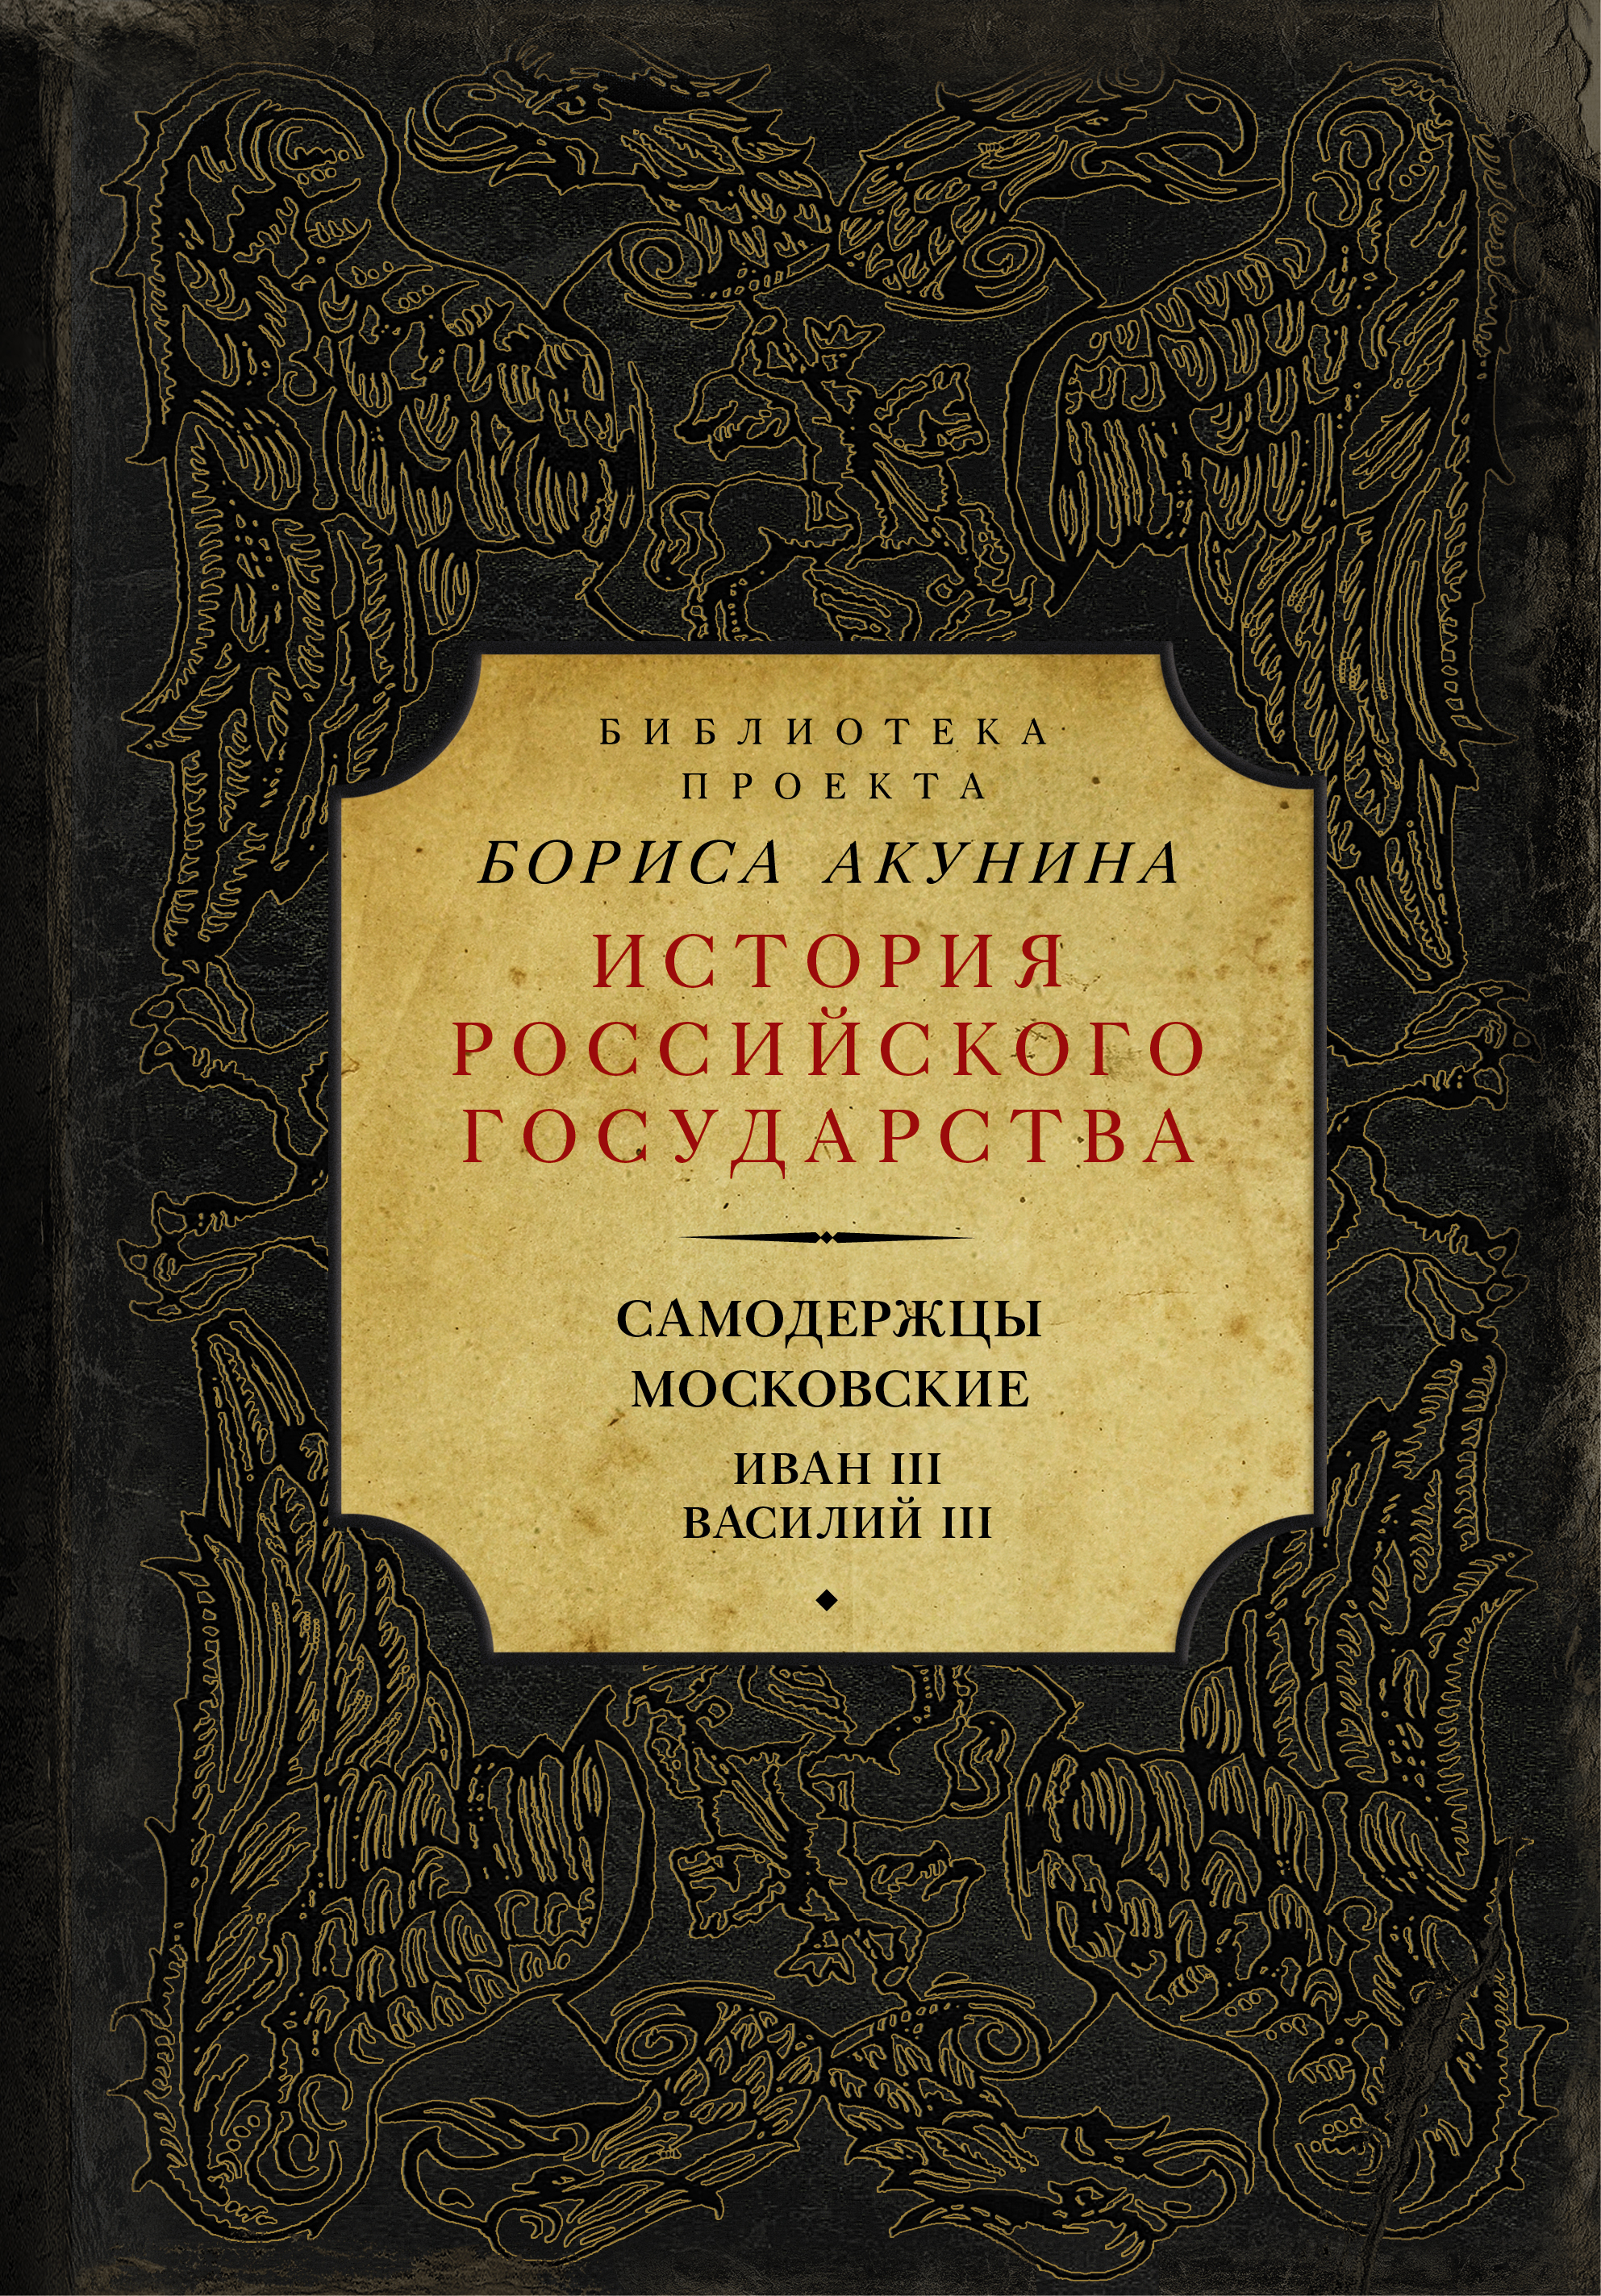 Борис Акунин Самодержцы московские. Иван III. Василий III